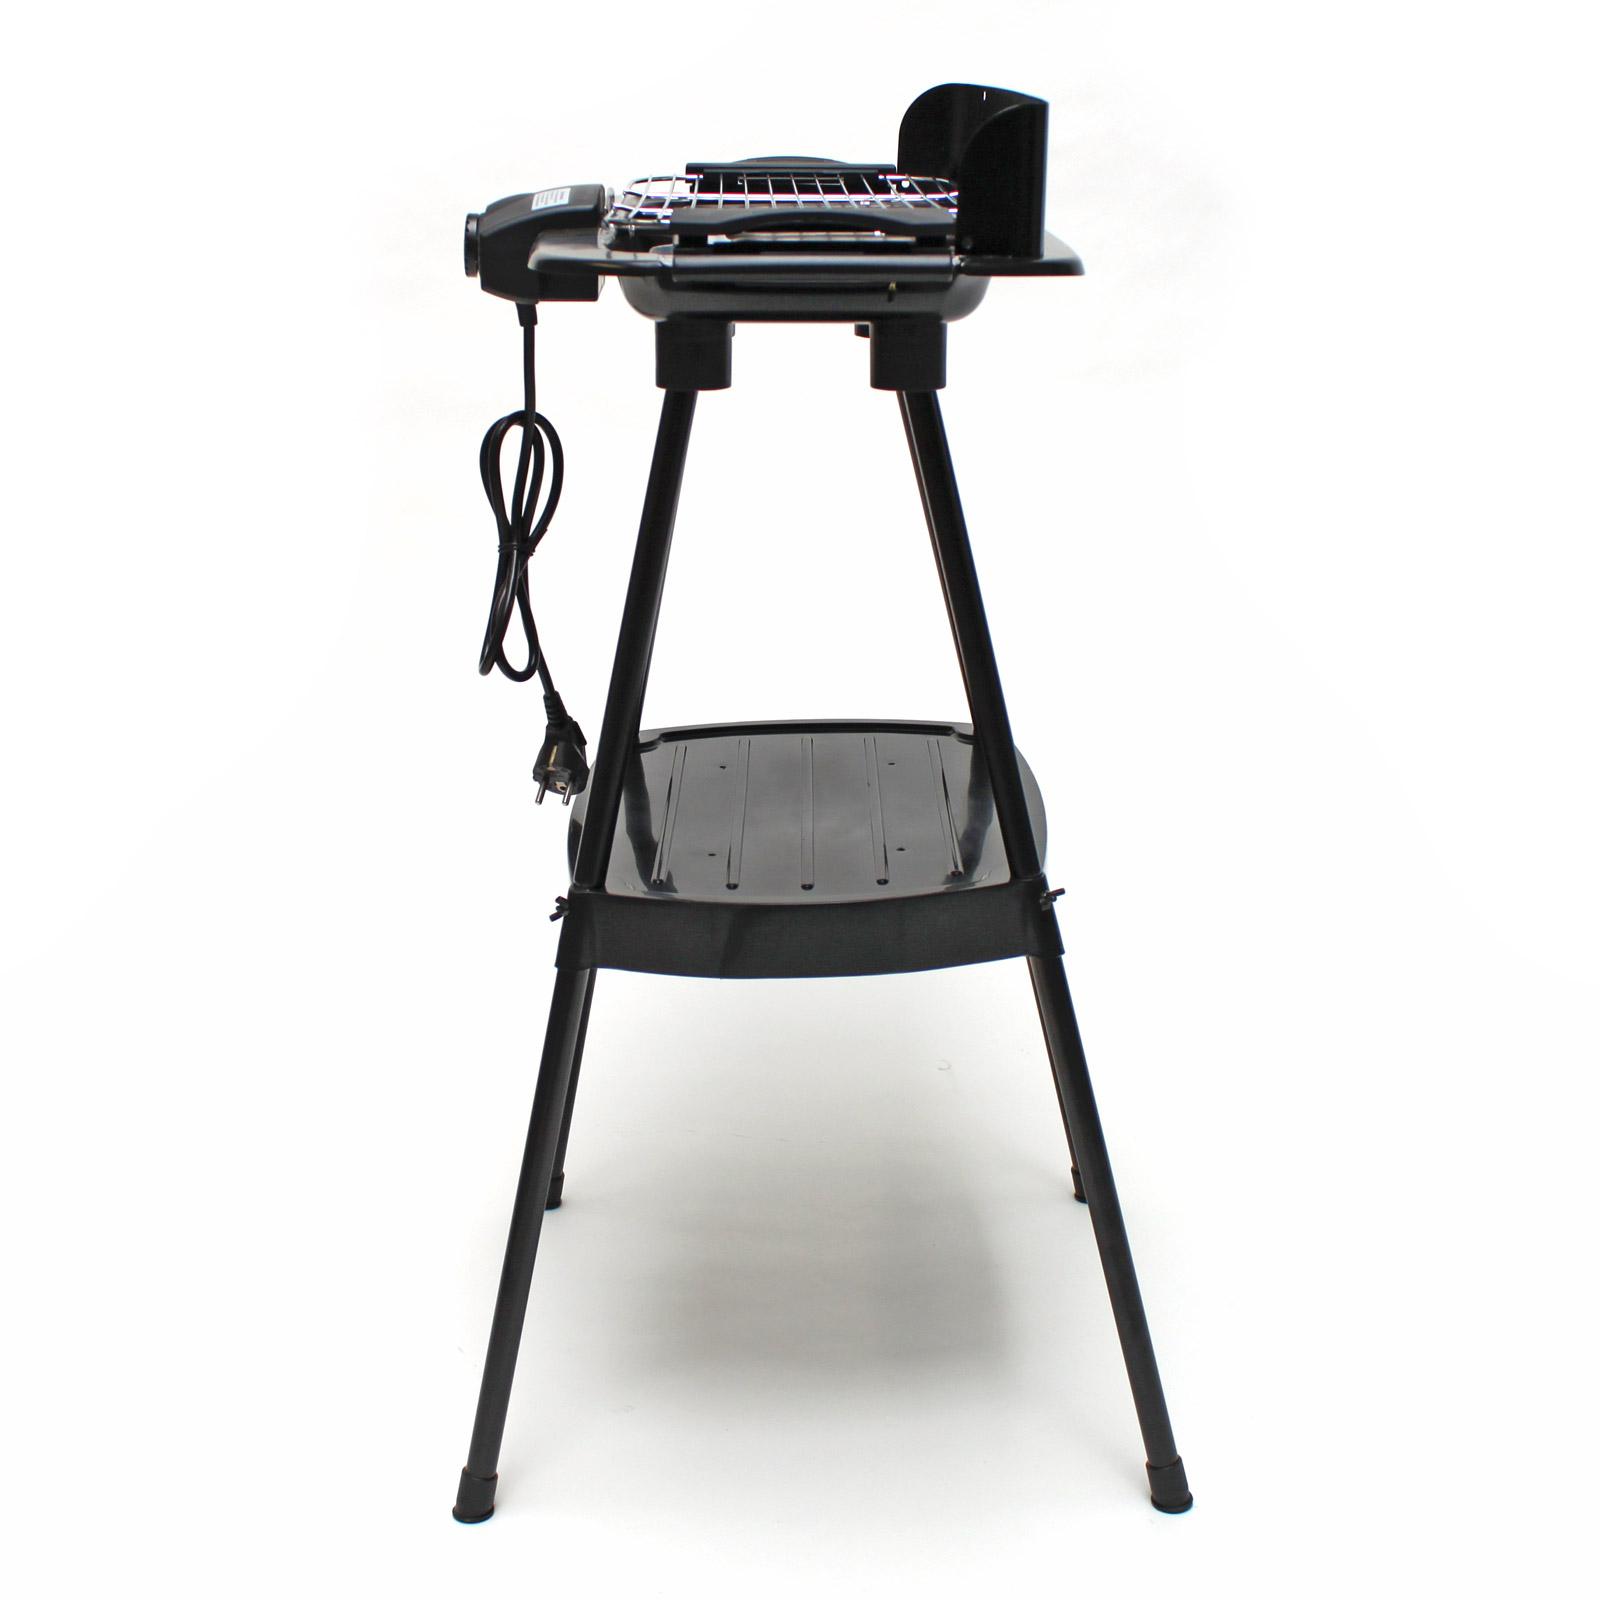 elektrogrill f r balkon elektrogrill incl rollbaren grillwagen tisch feldafing der. Black Bedroom Furniture Sets. Home Design Ideas